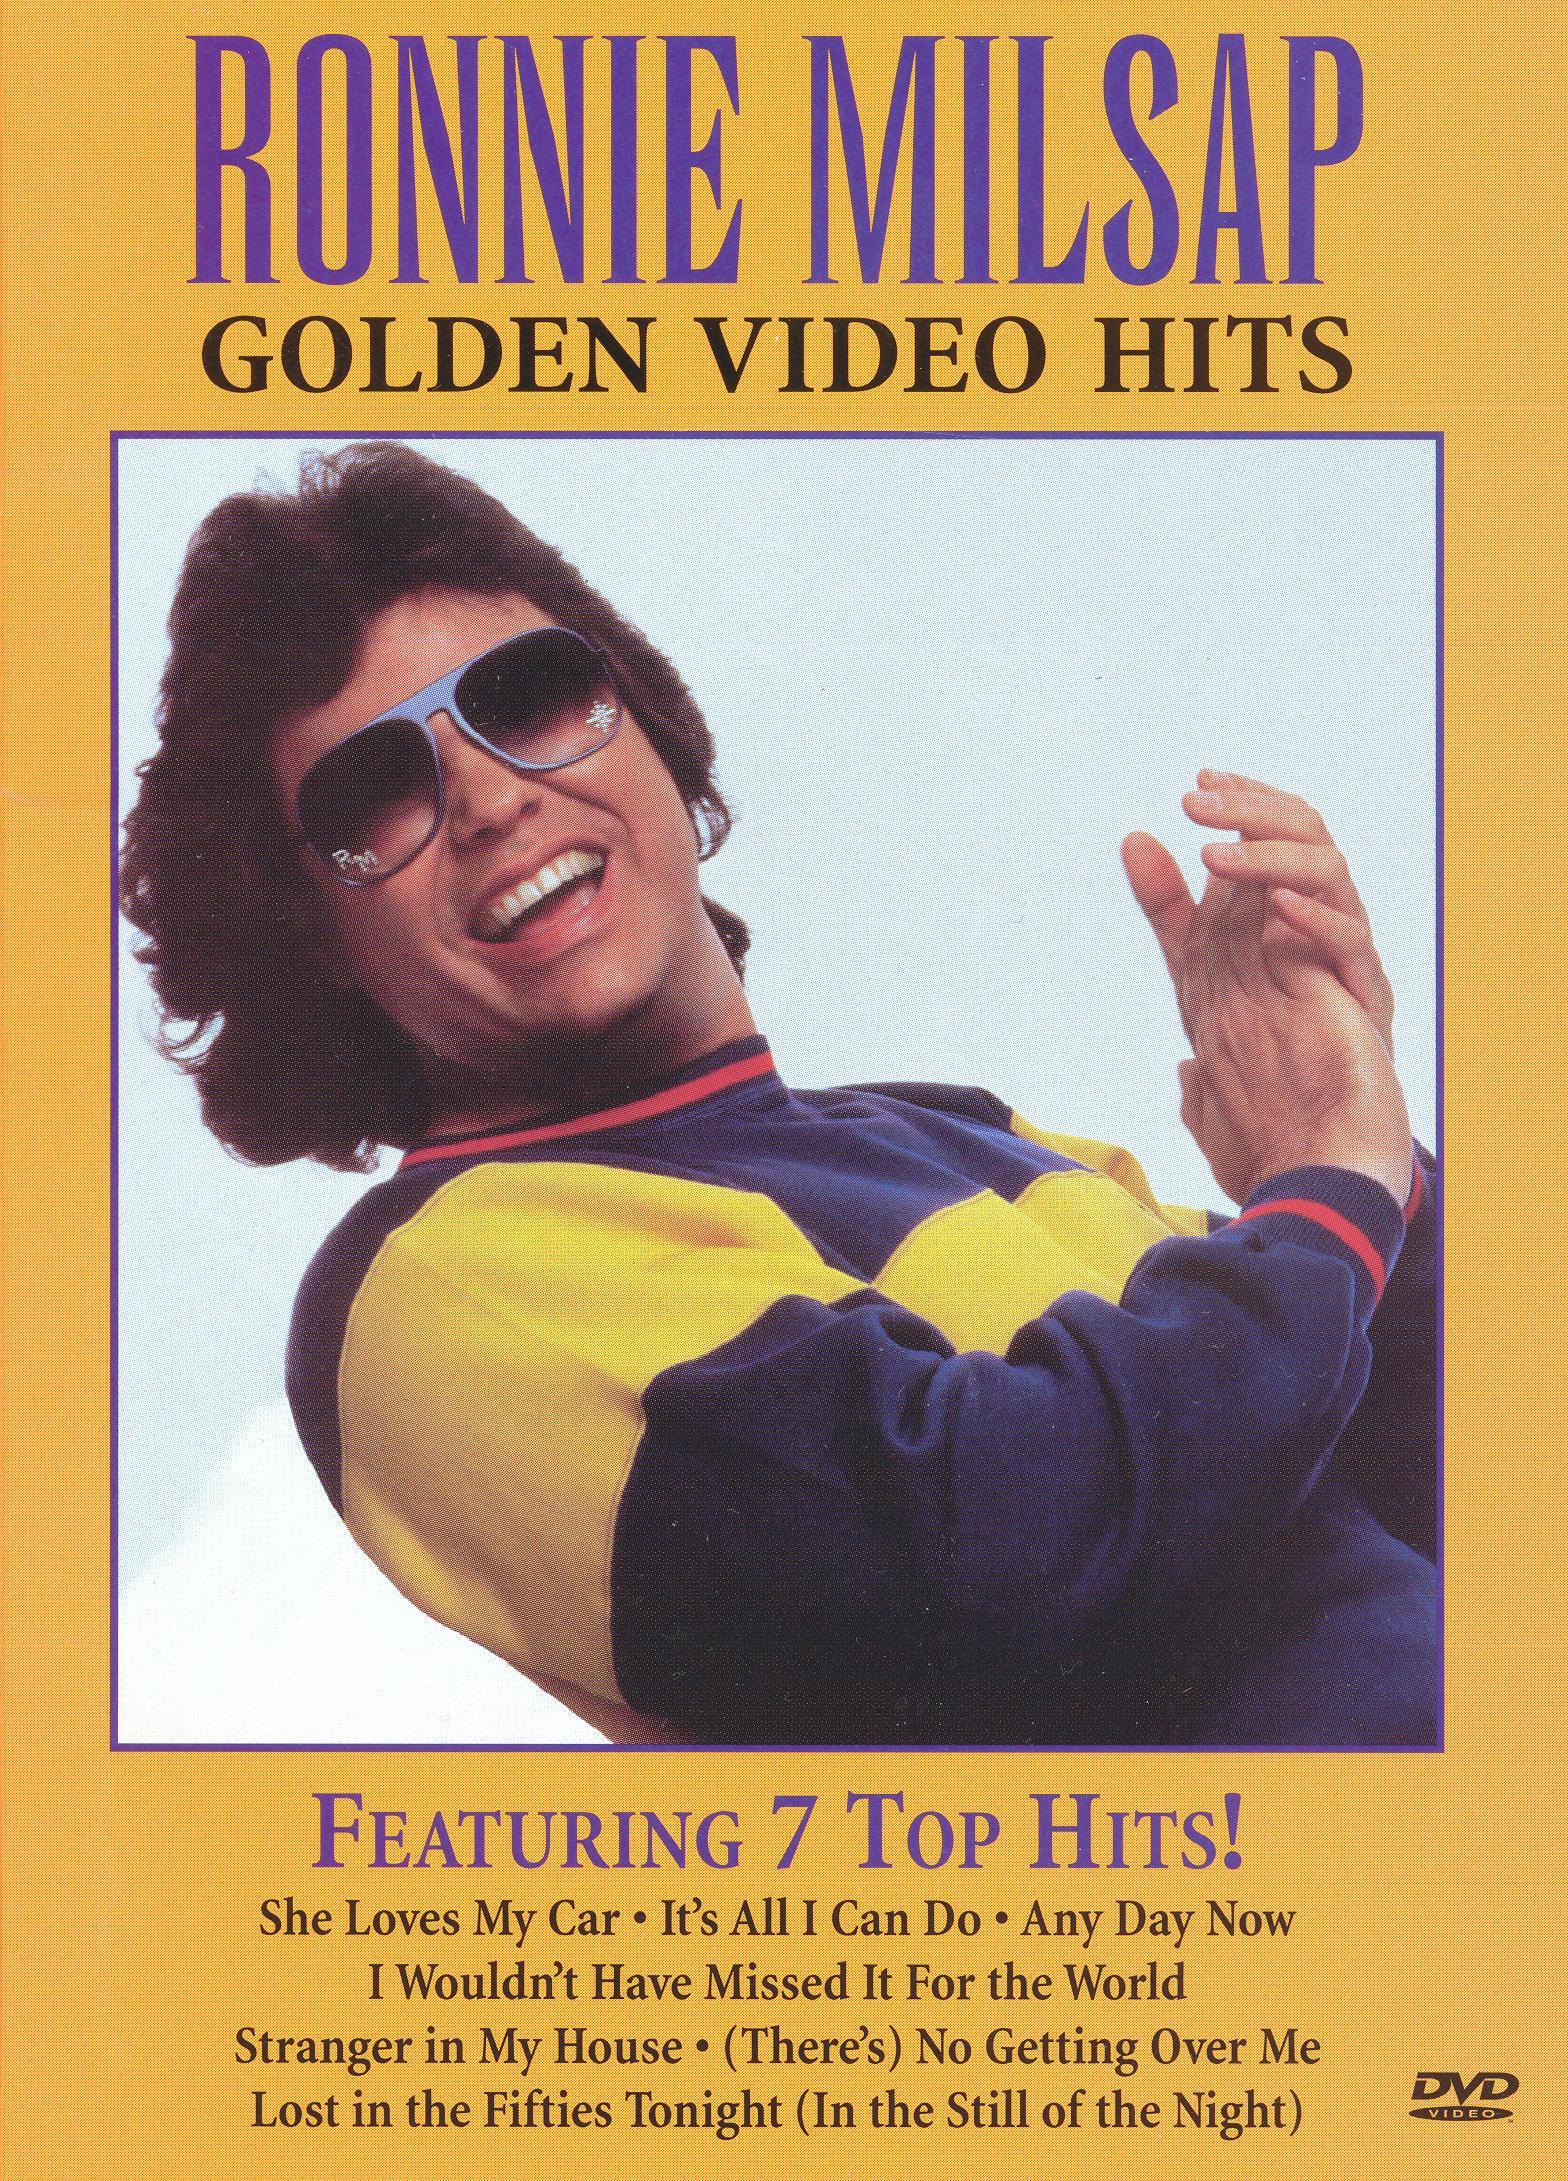 Ronnie Milsap: Golden Video Hits